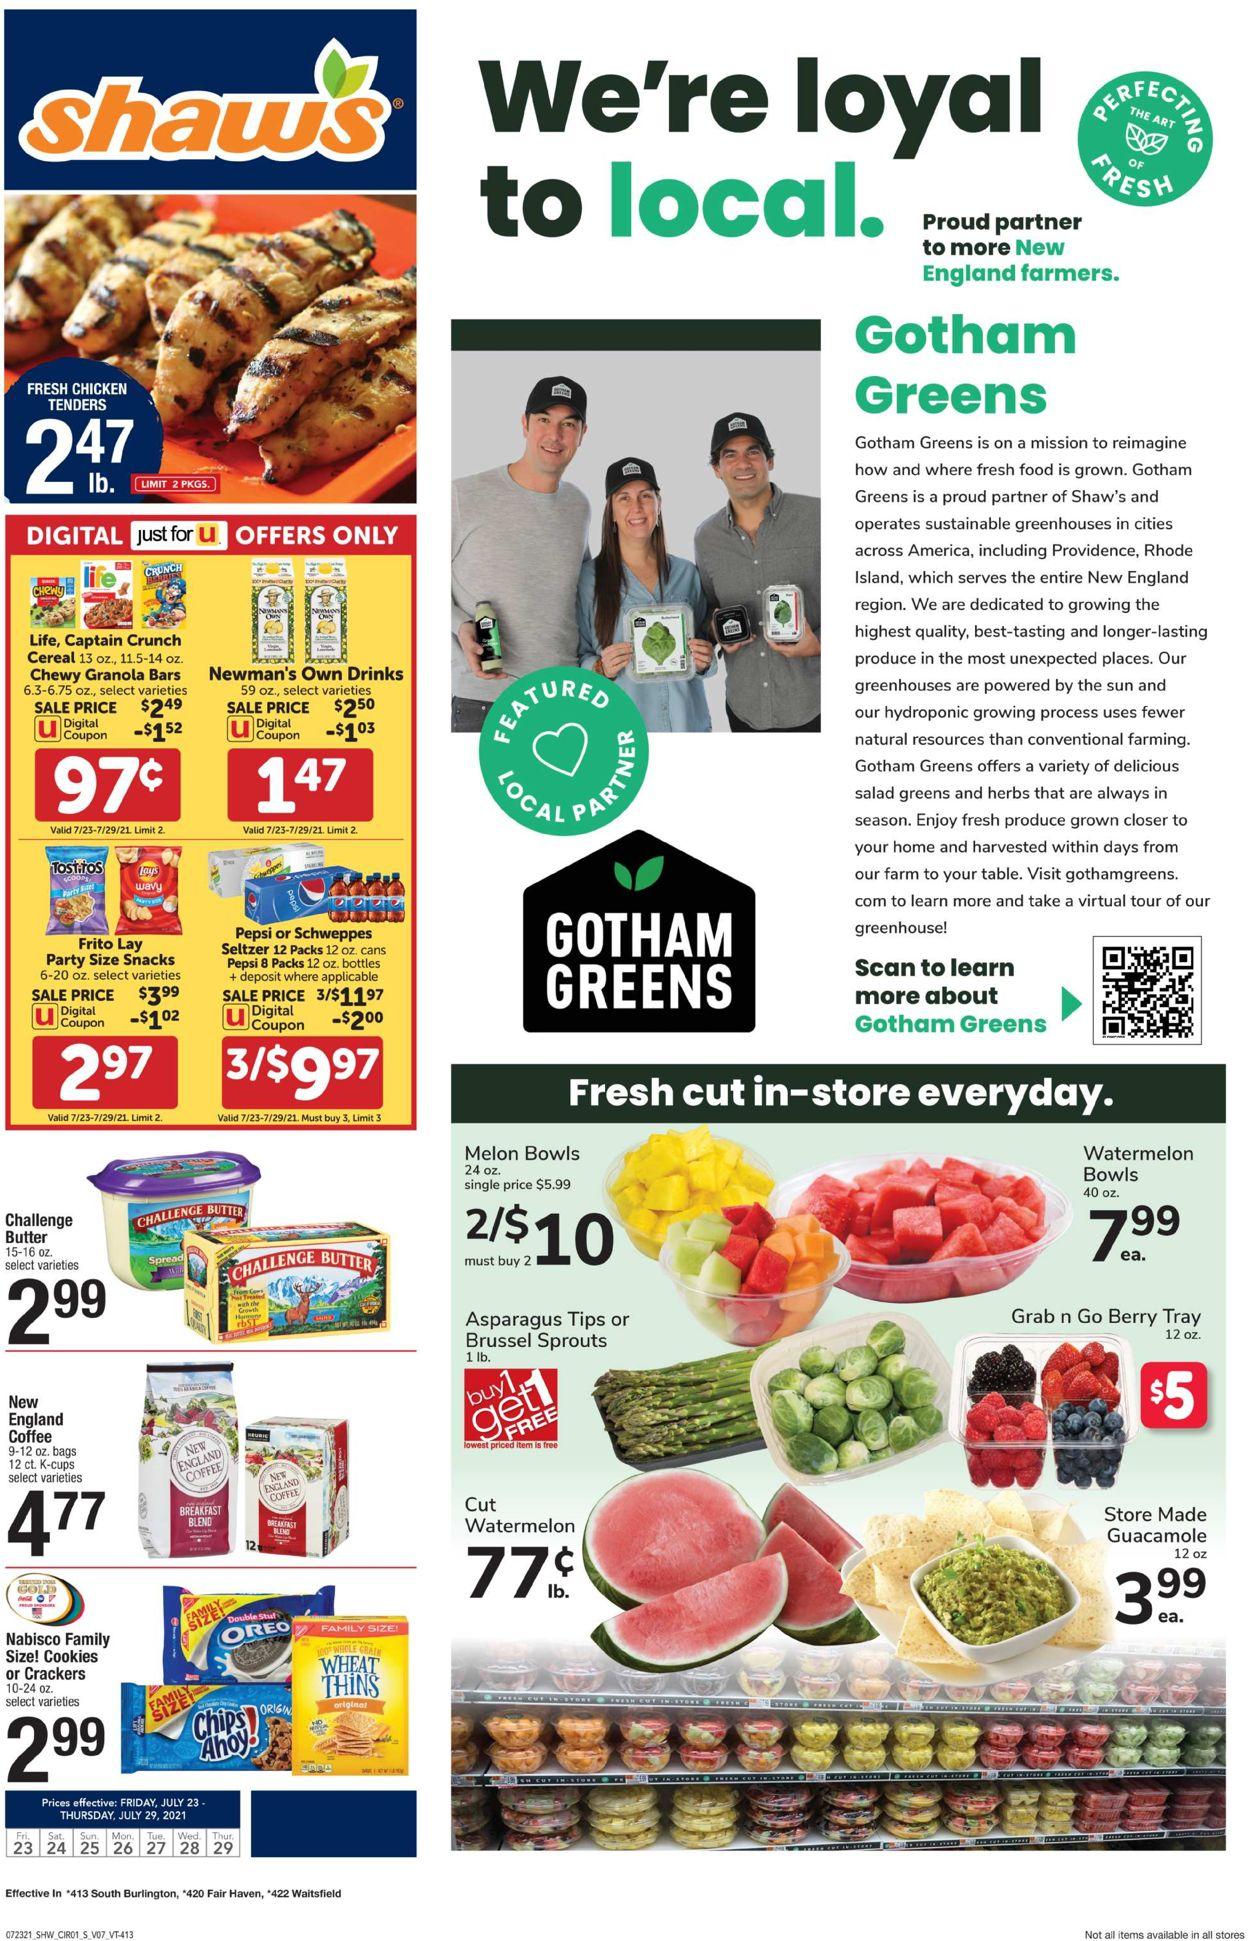 Shaw's Weekly Ad Circular - valid 07/23-07/29/2021